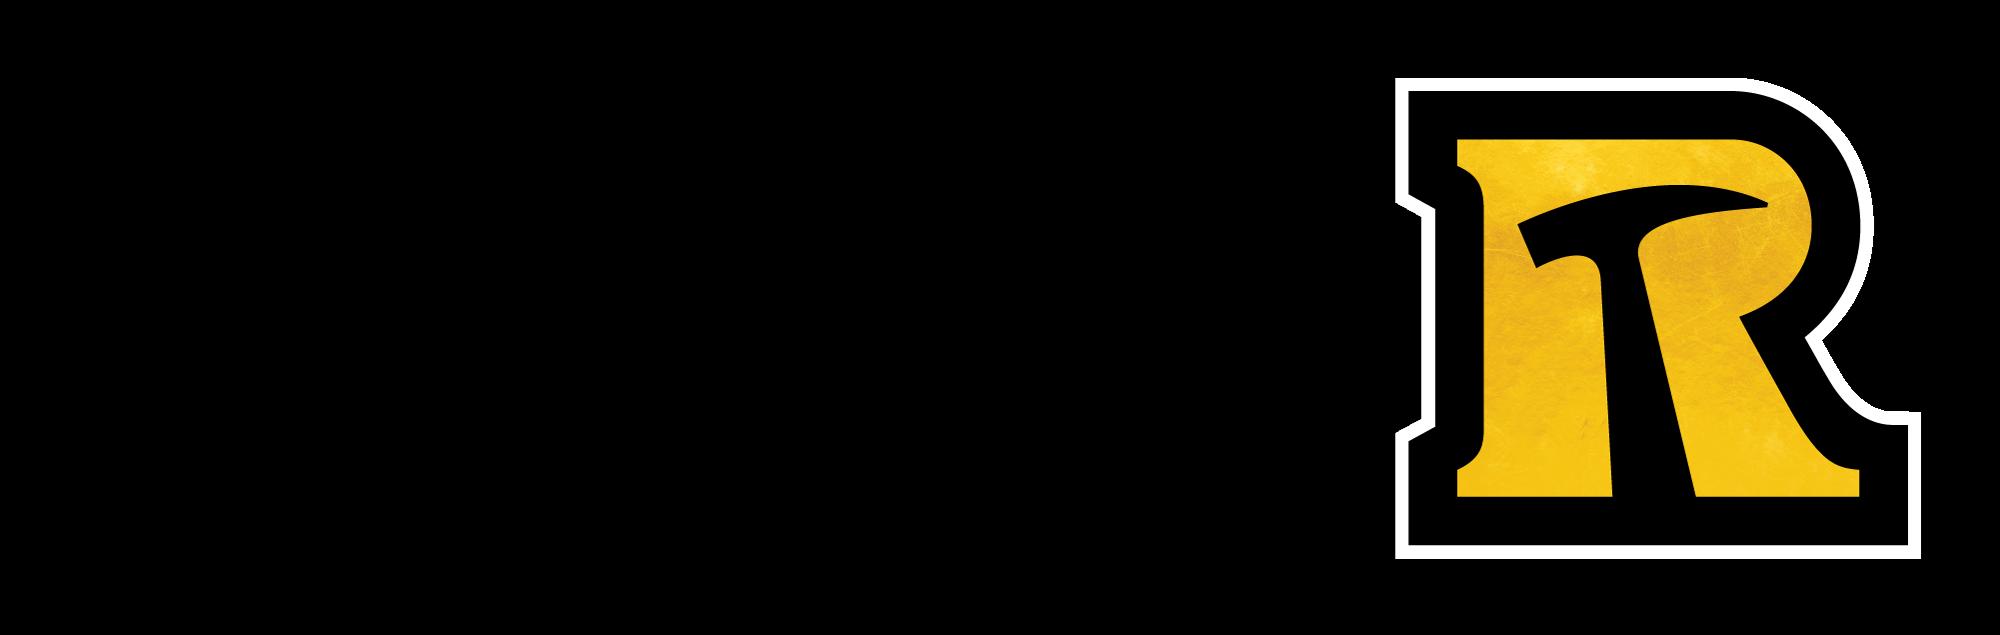 Resolute Mining Ltd. Logo